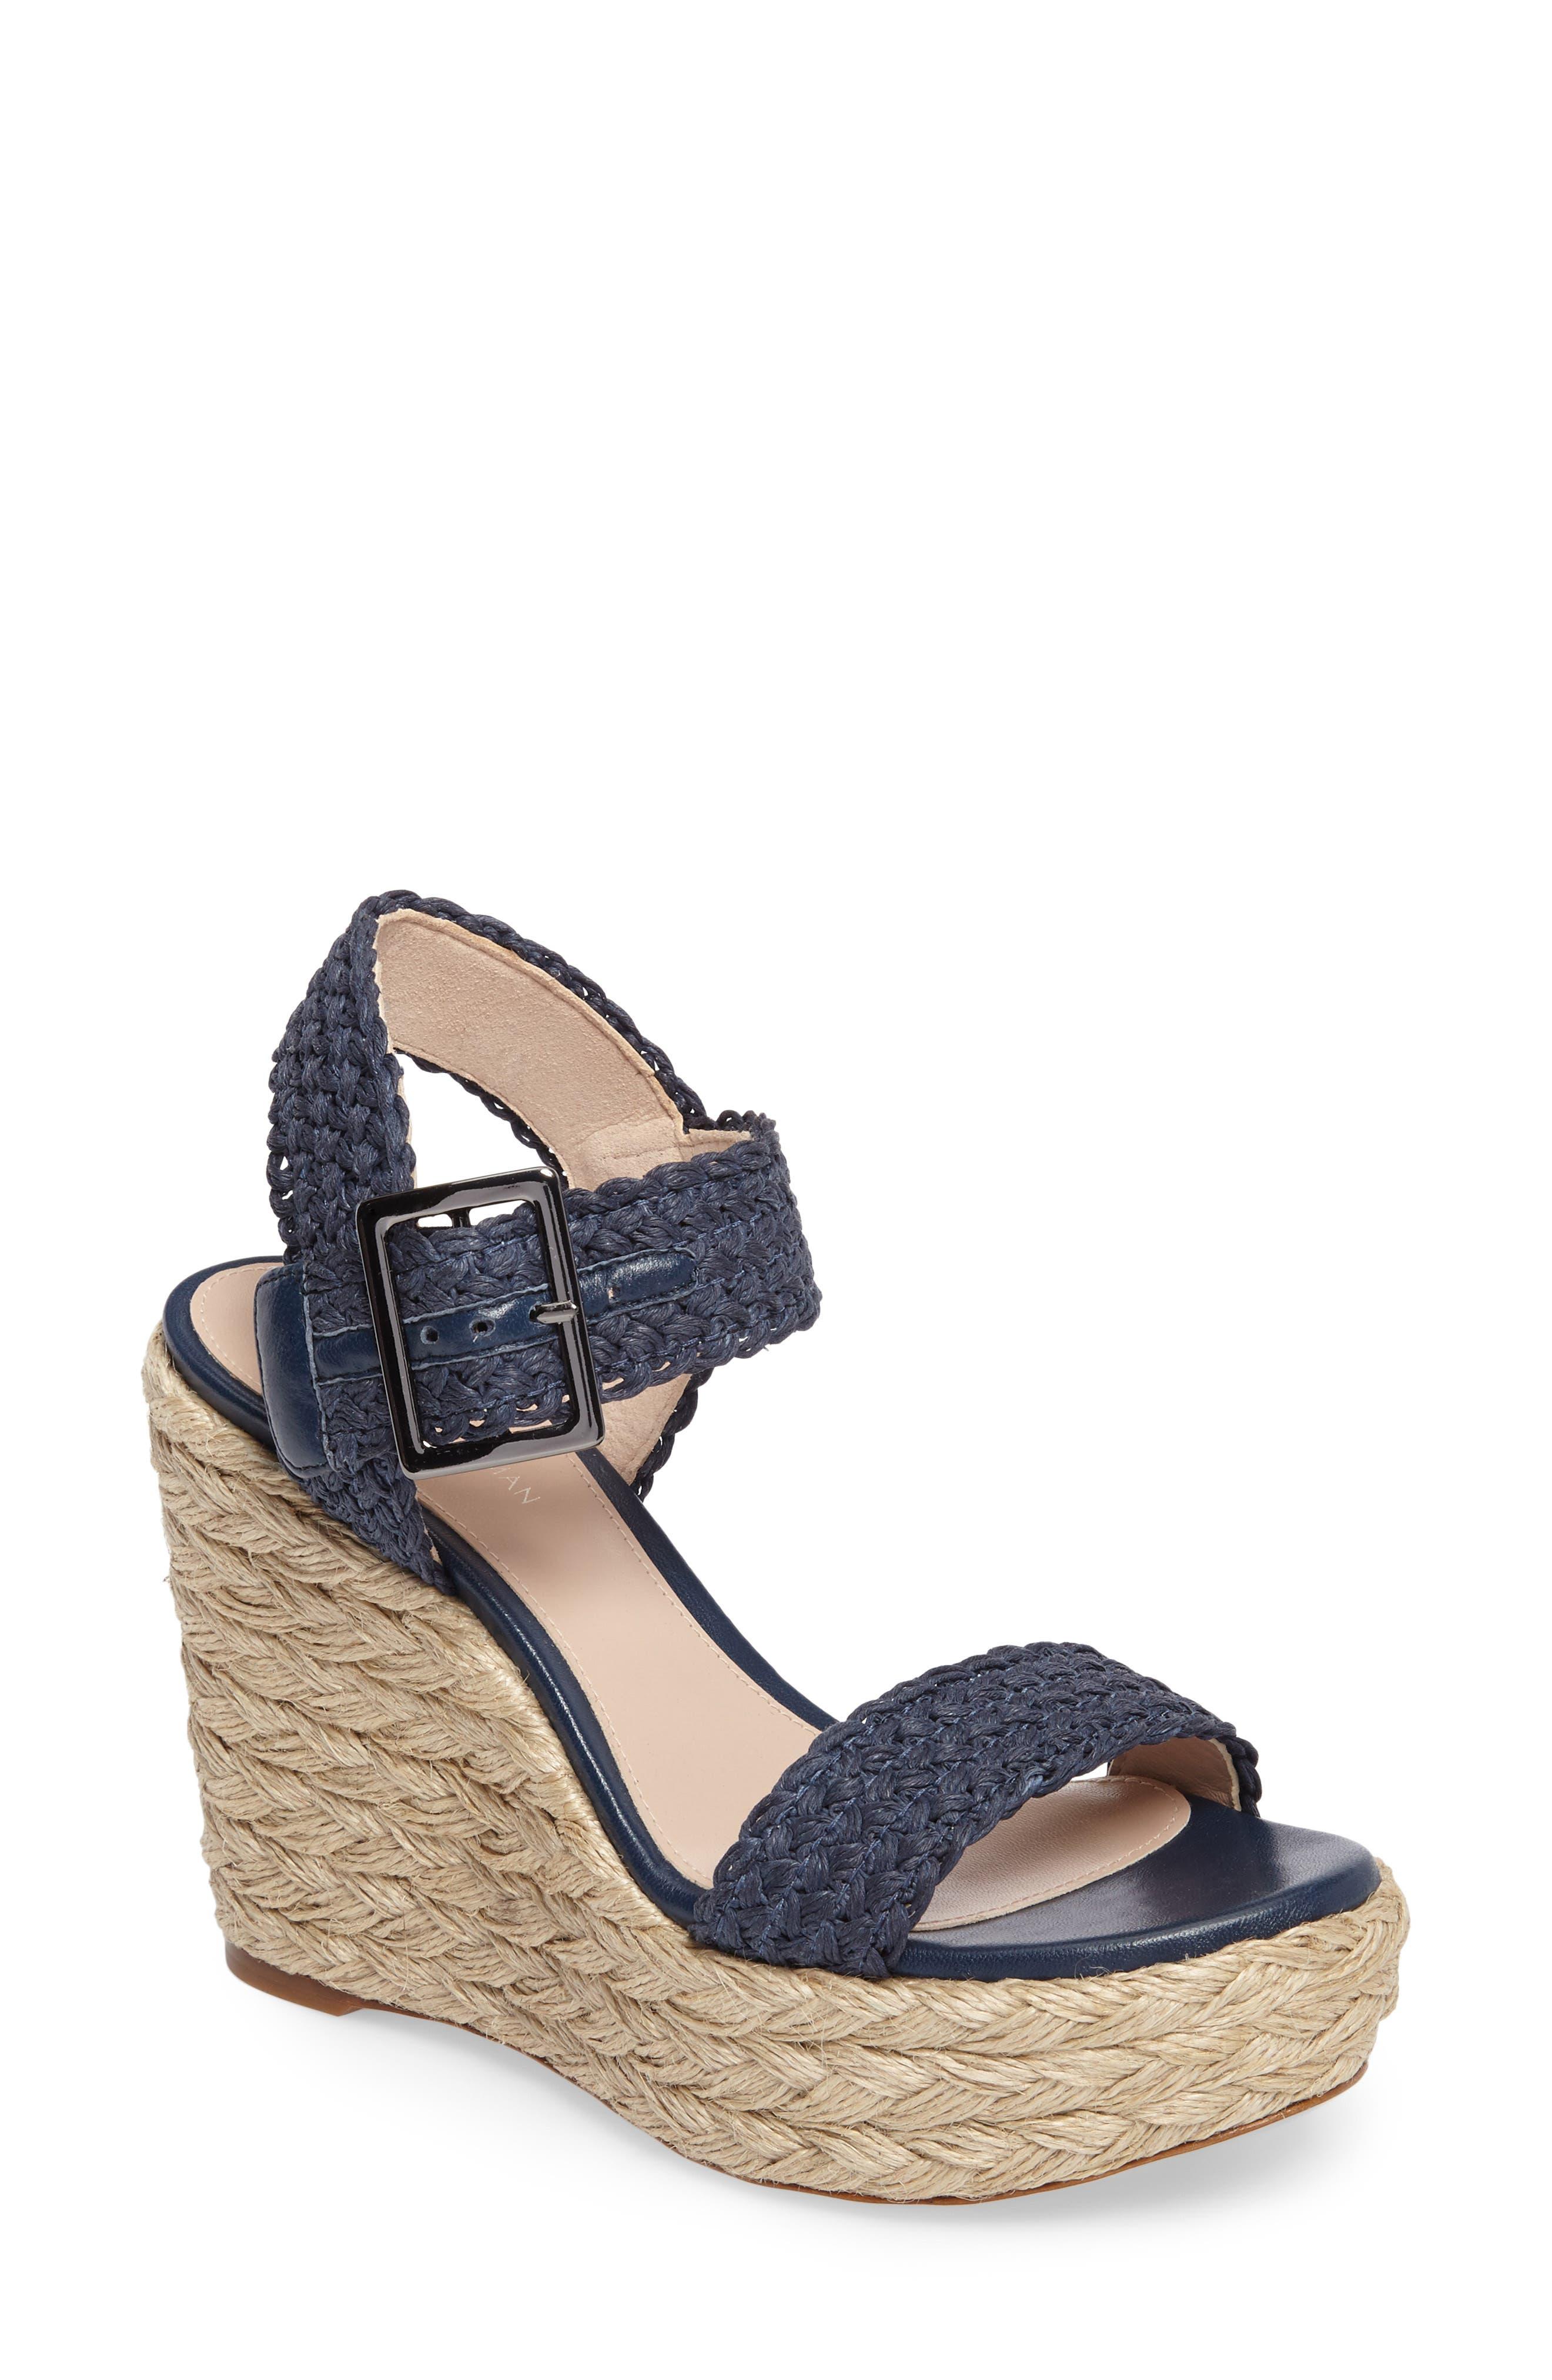 Alexis Espadrille Platform Wedge,                         Main,                         color, Nice Blue Crochet